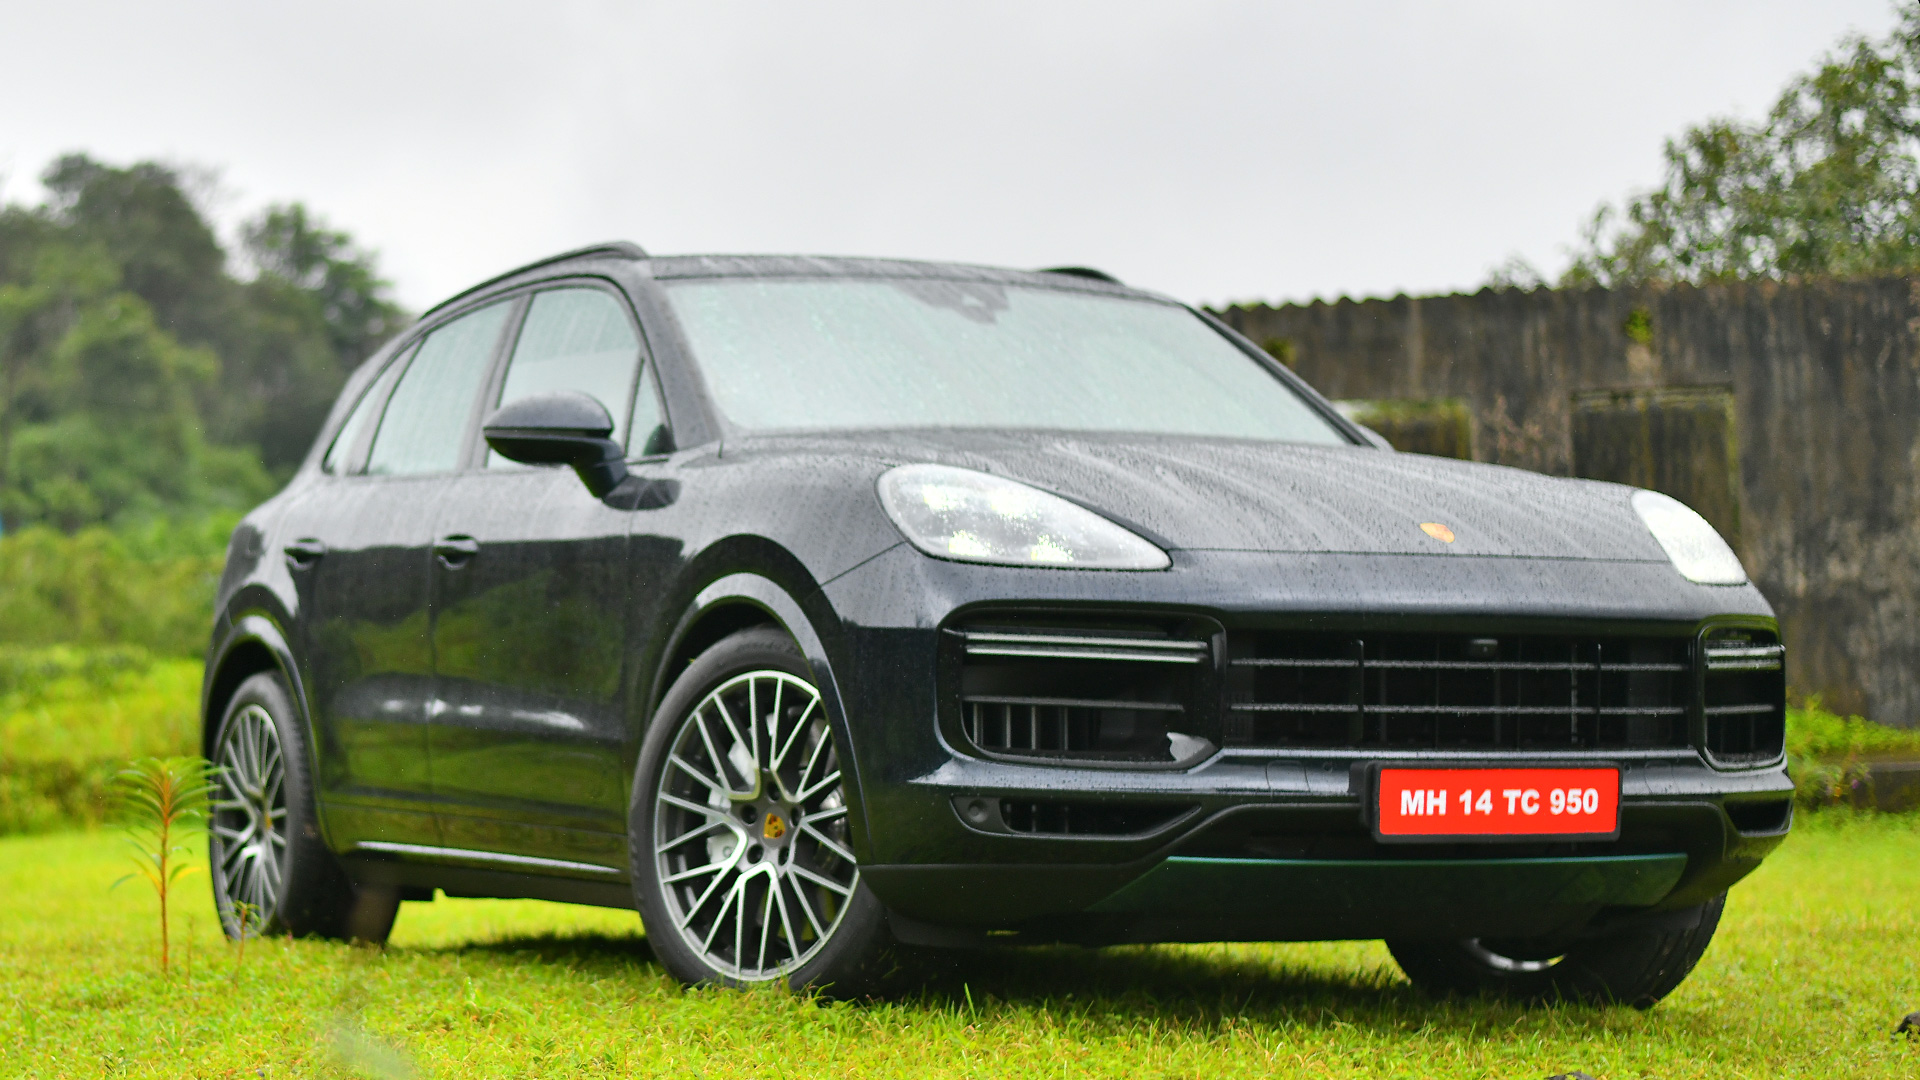 Porsche Cayenne 2019 Price Mileage Reviews Specification